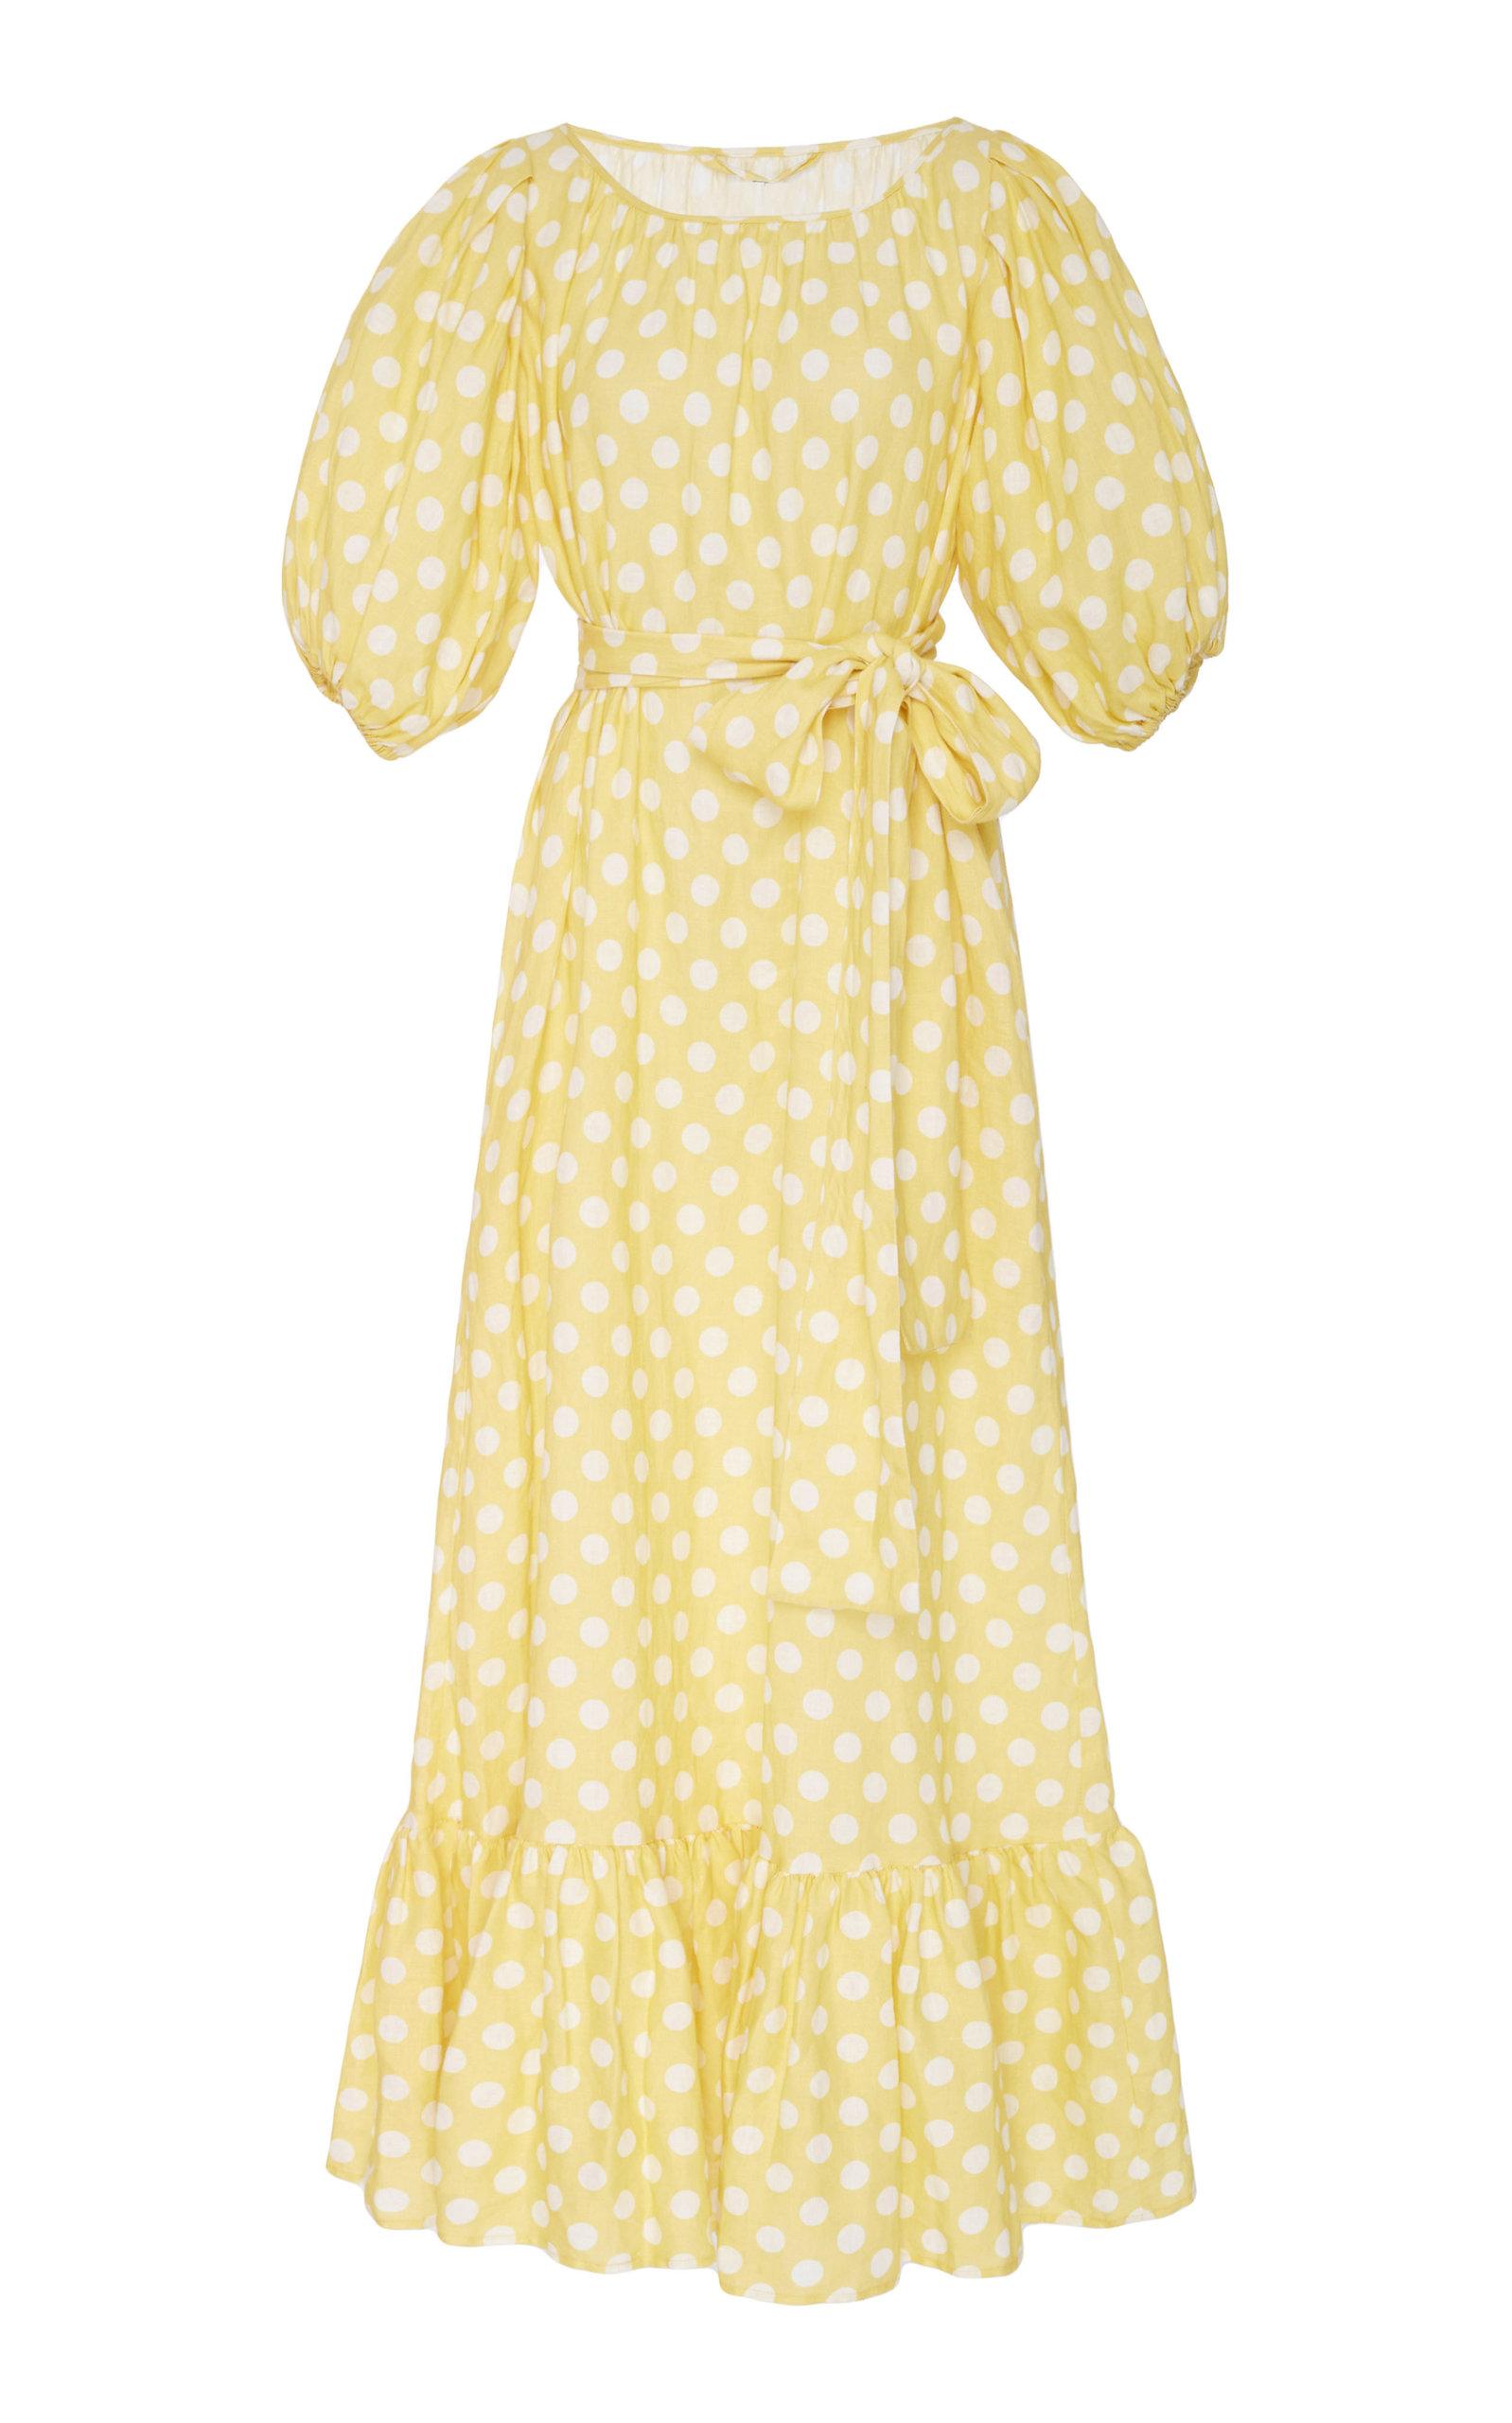 Discount For Sale Collections Polka-dot Linen Midi Dress - White Lisa Marie Fernandez Cheap Low Price n6vC96ZuVU